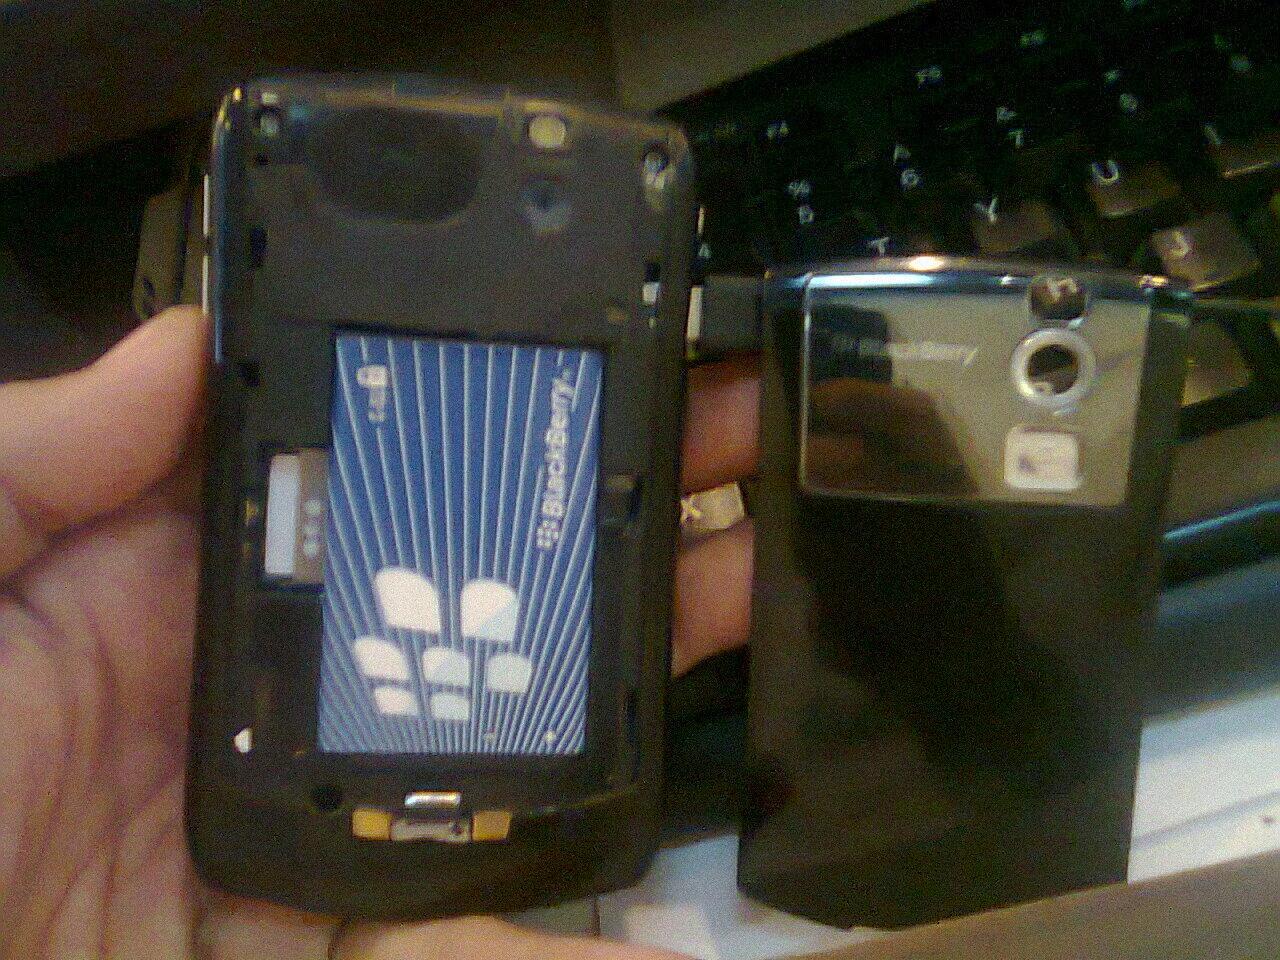 Blackberry 8320 suspend kondisi masih seger